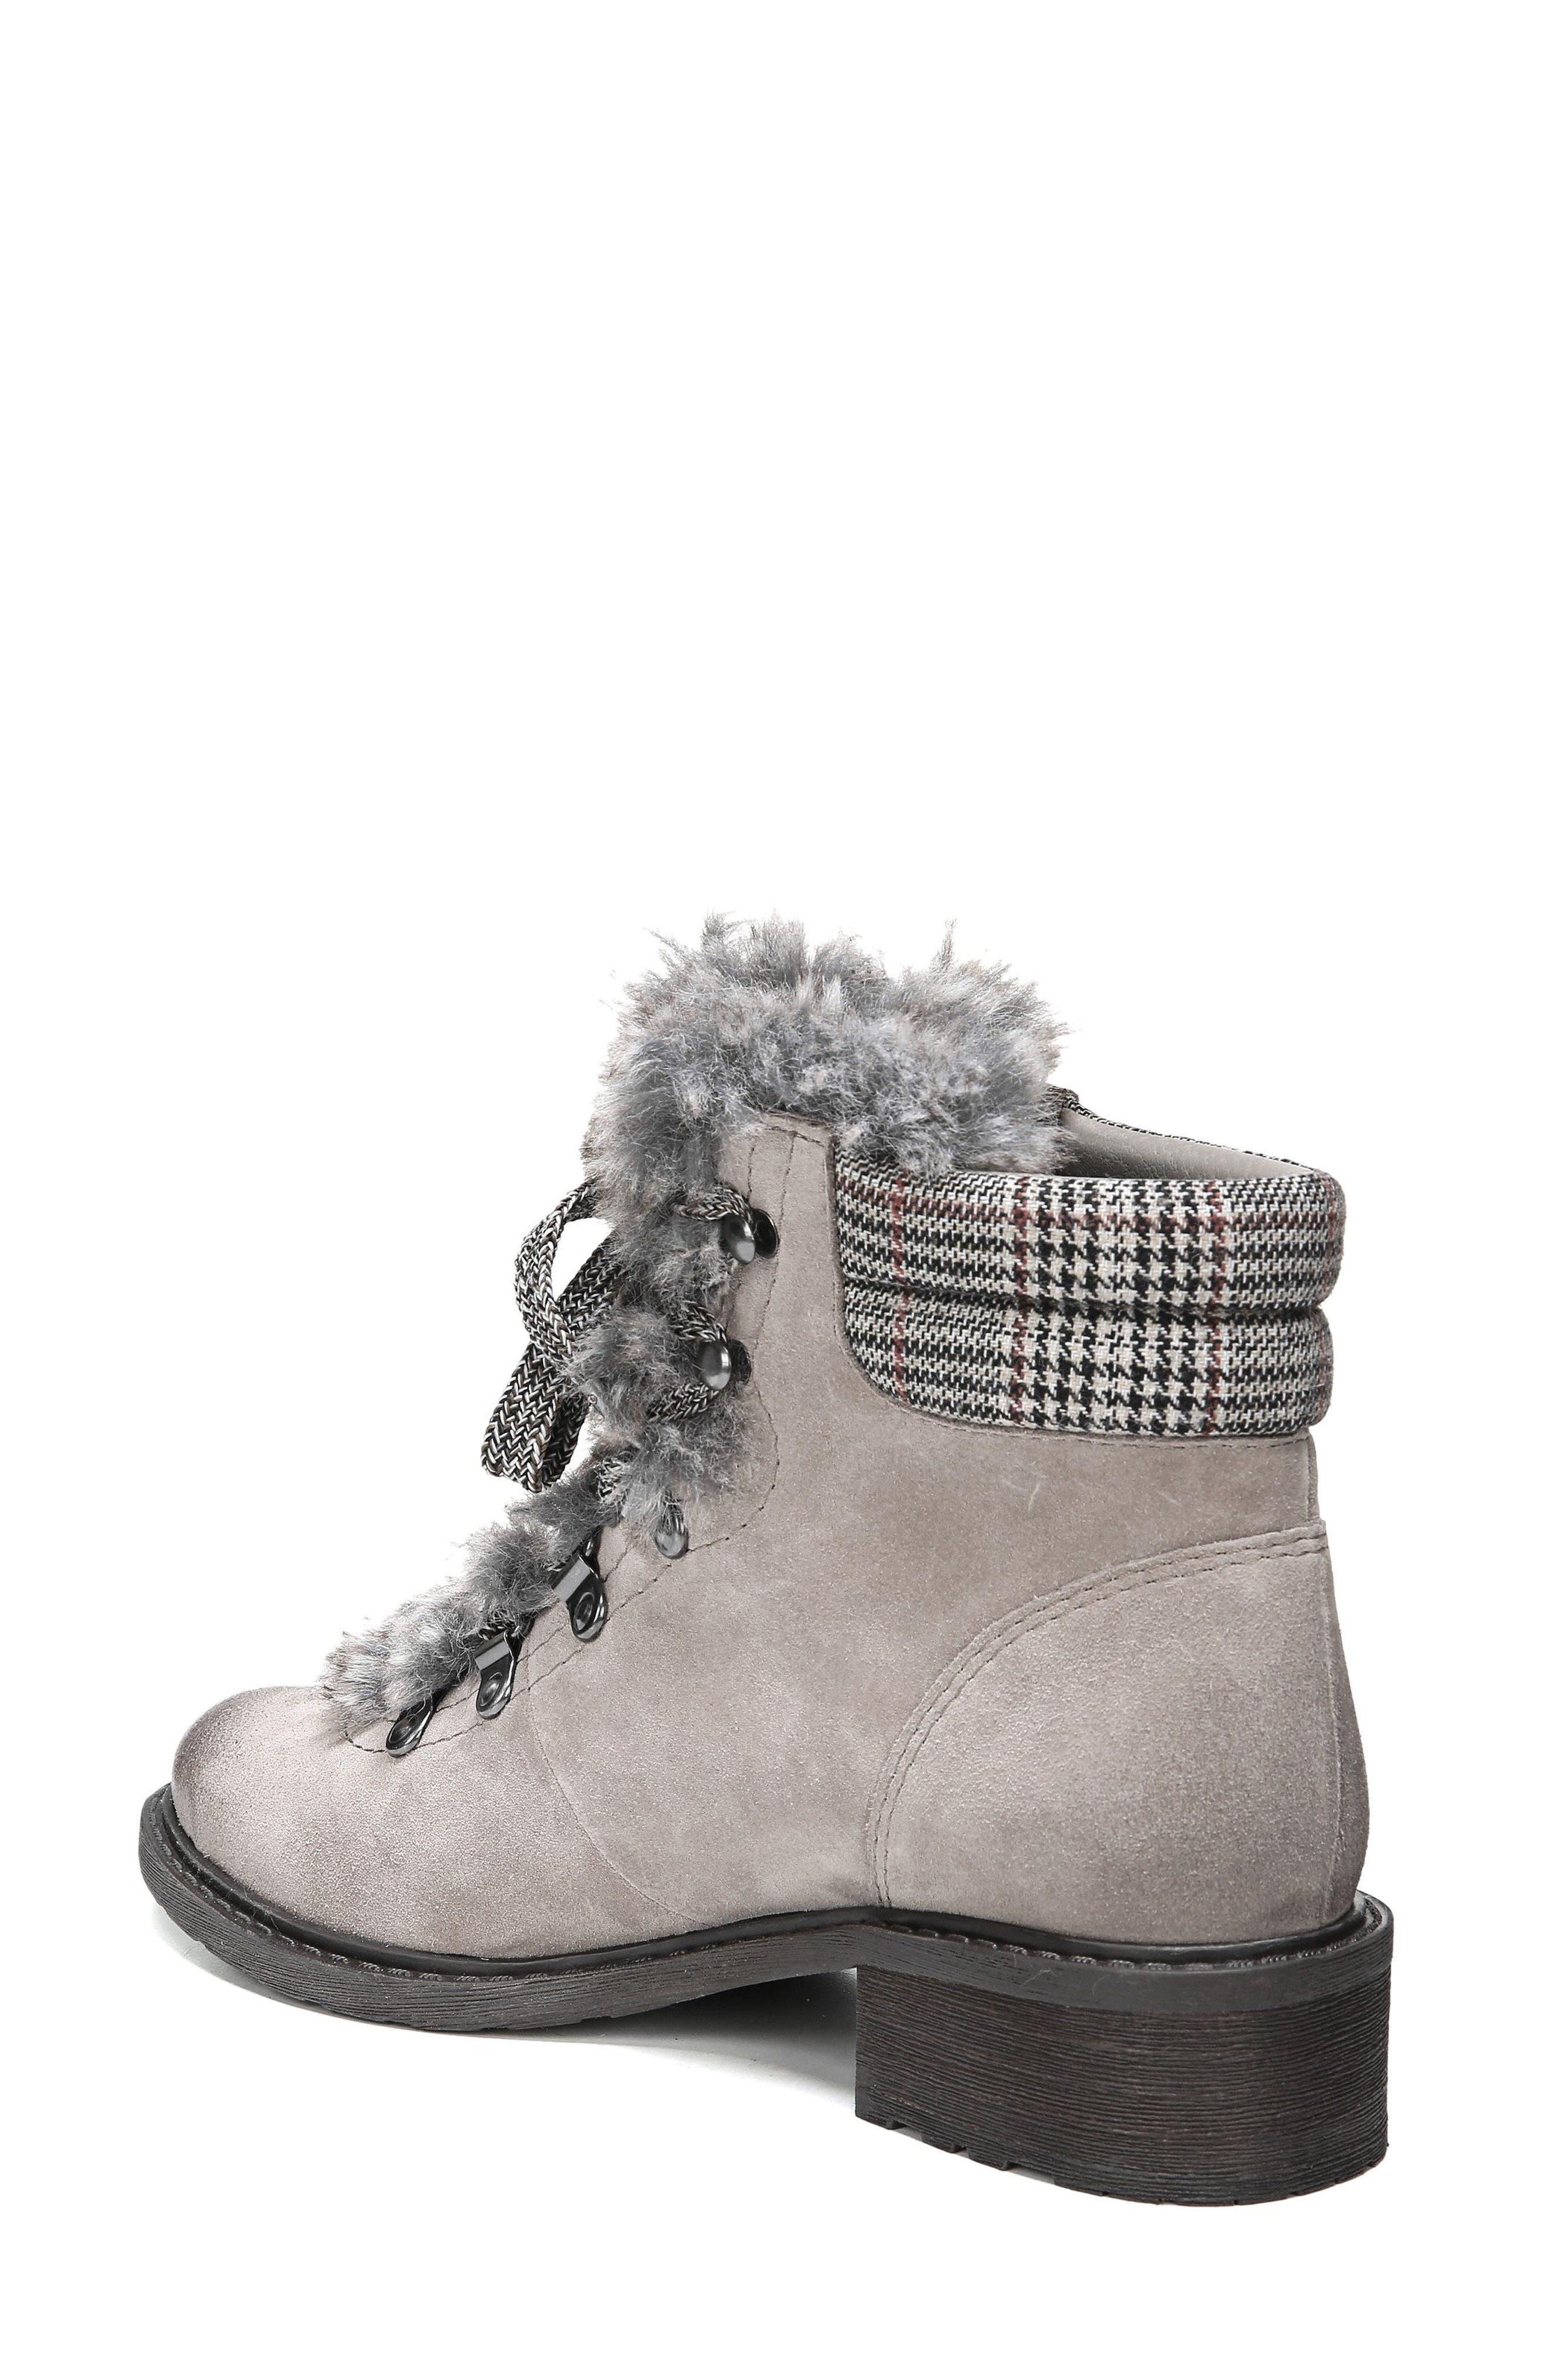 Darrah 2 Faux Fur Trim Boot,                             Alternate thumbnail 2, color,                             Grey Multi Suede